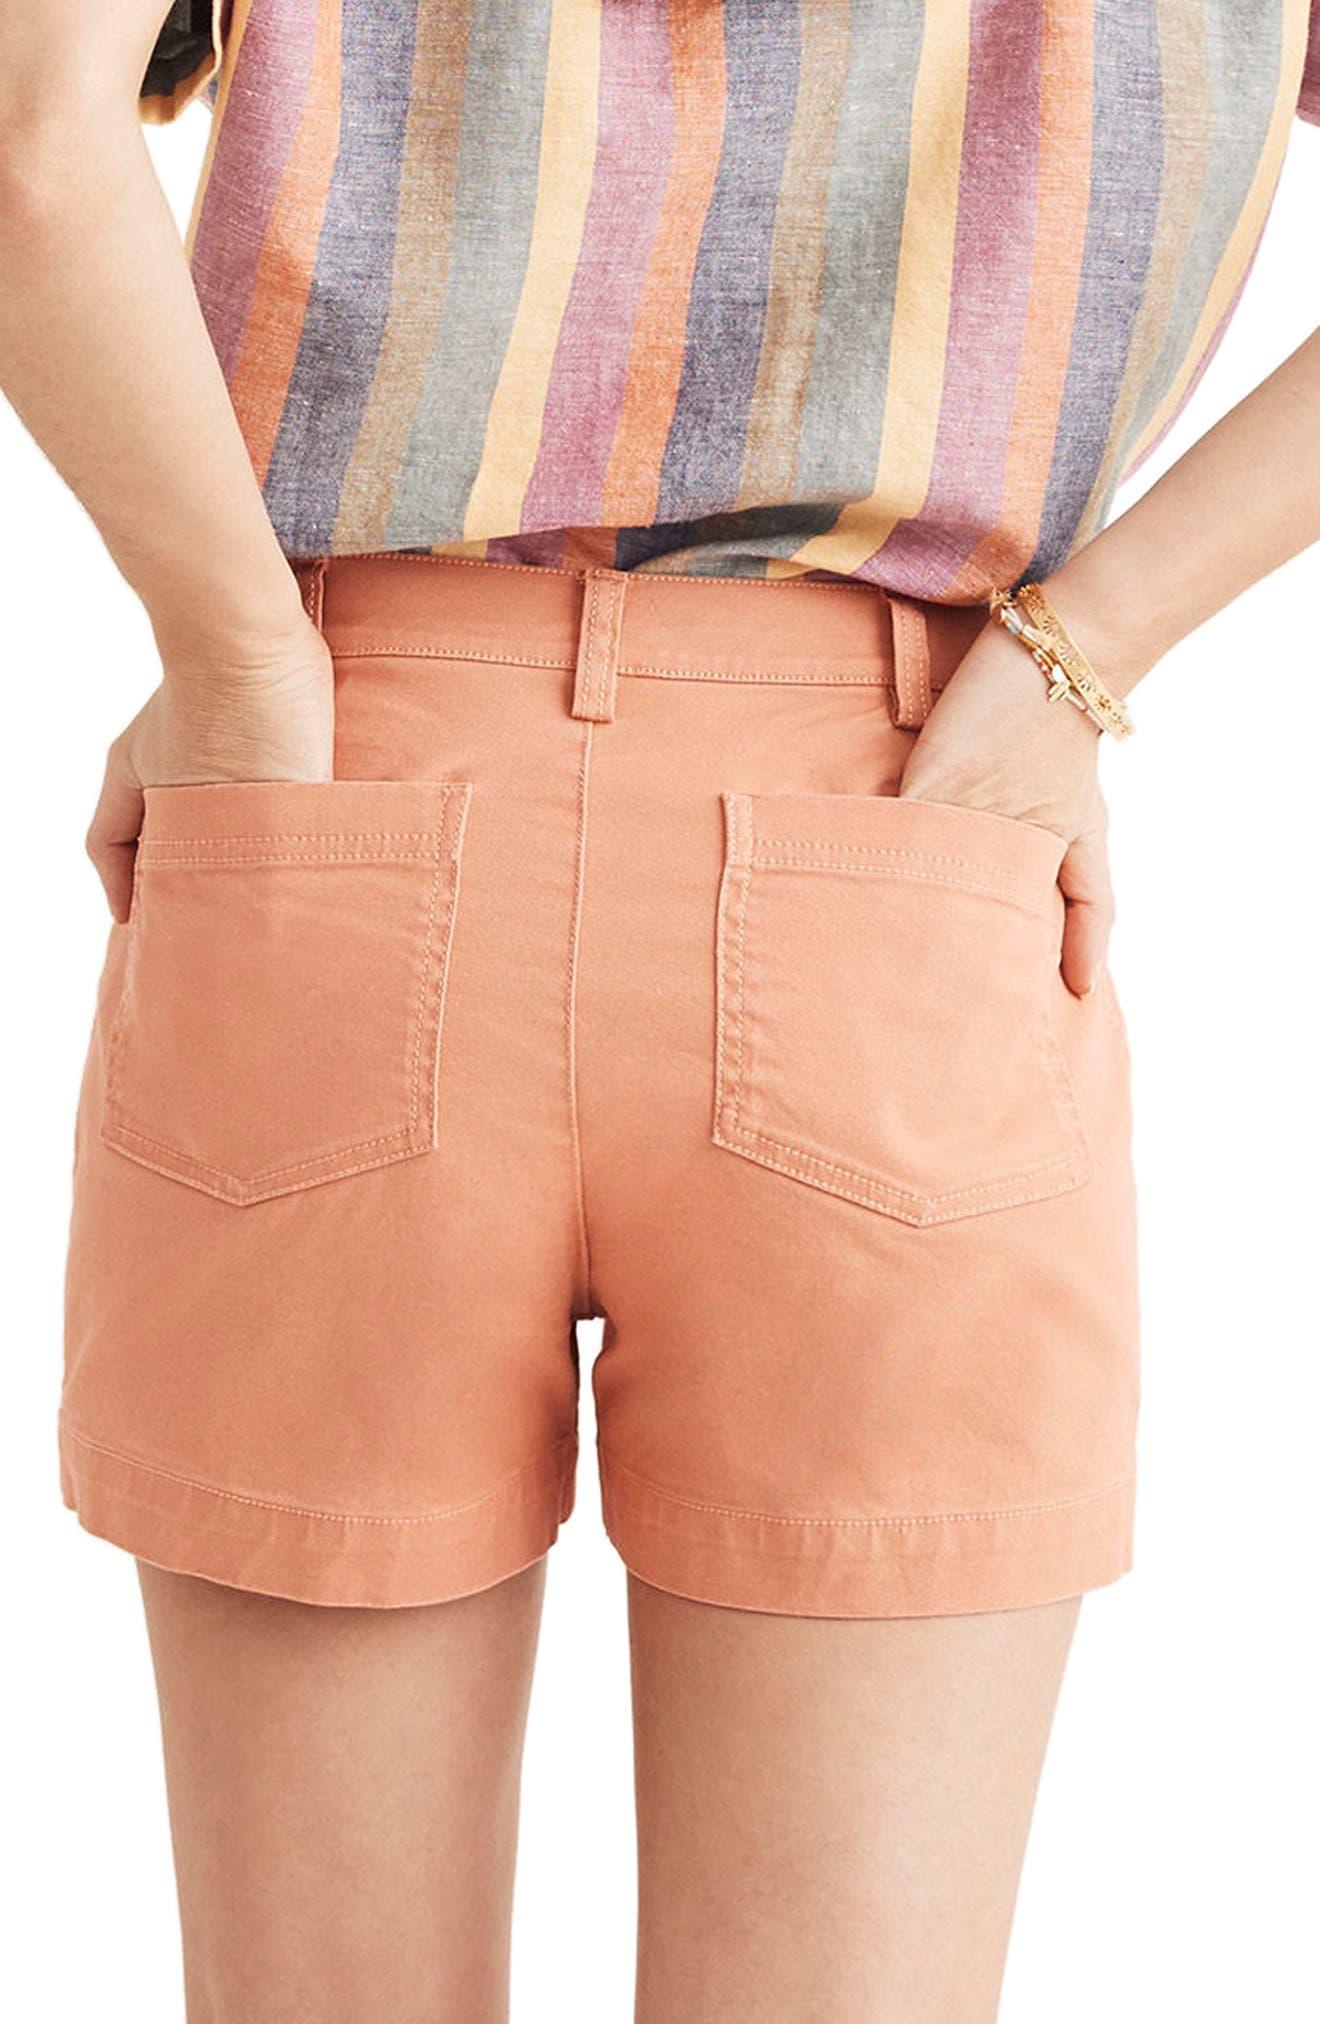 Emmett Button Front Shorts,                             Alternate thumbnail 2, color,                             Dried Coral